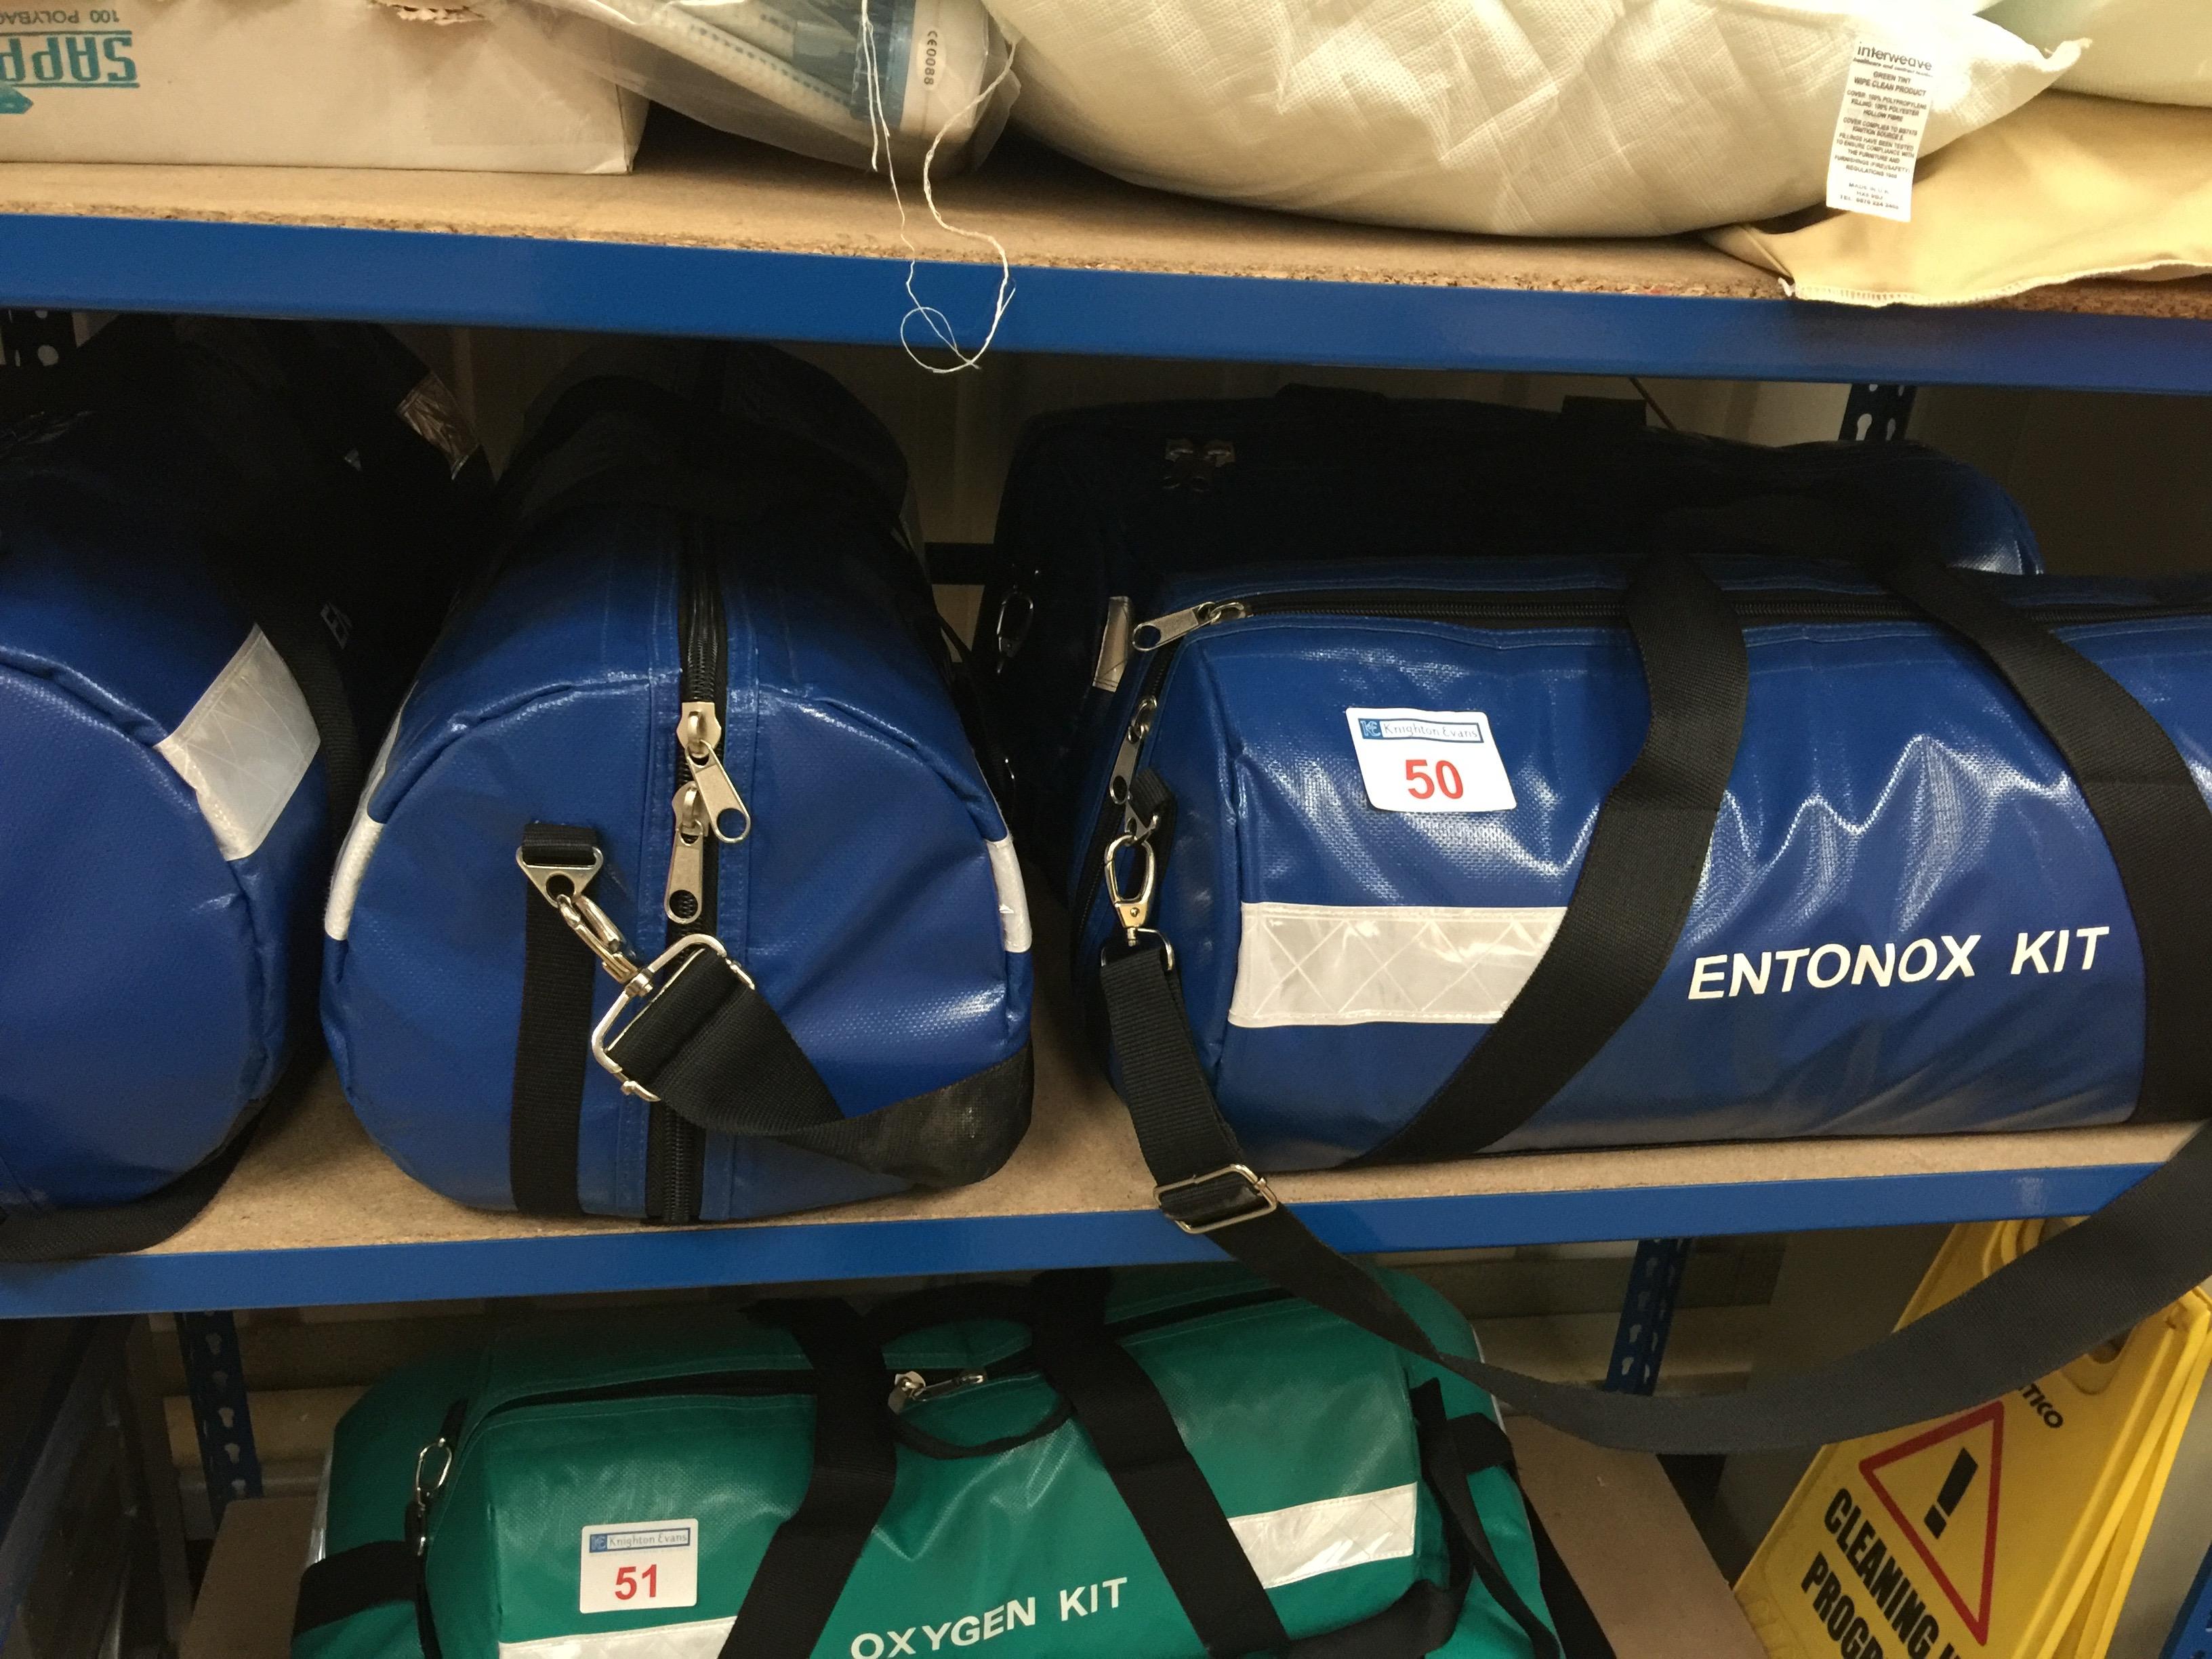 Lot 50 - 4 Paramedic Entonox kits